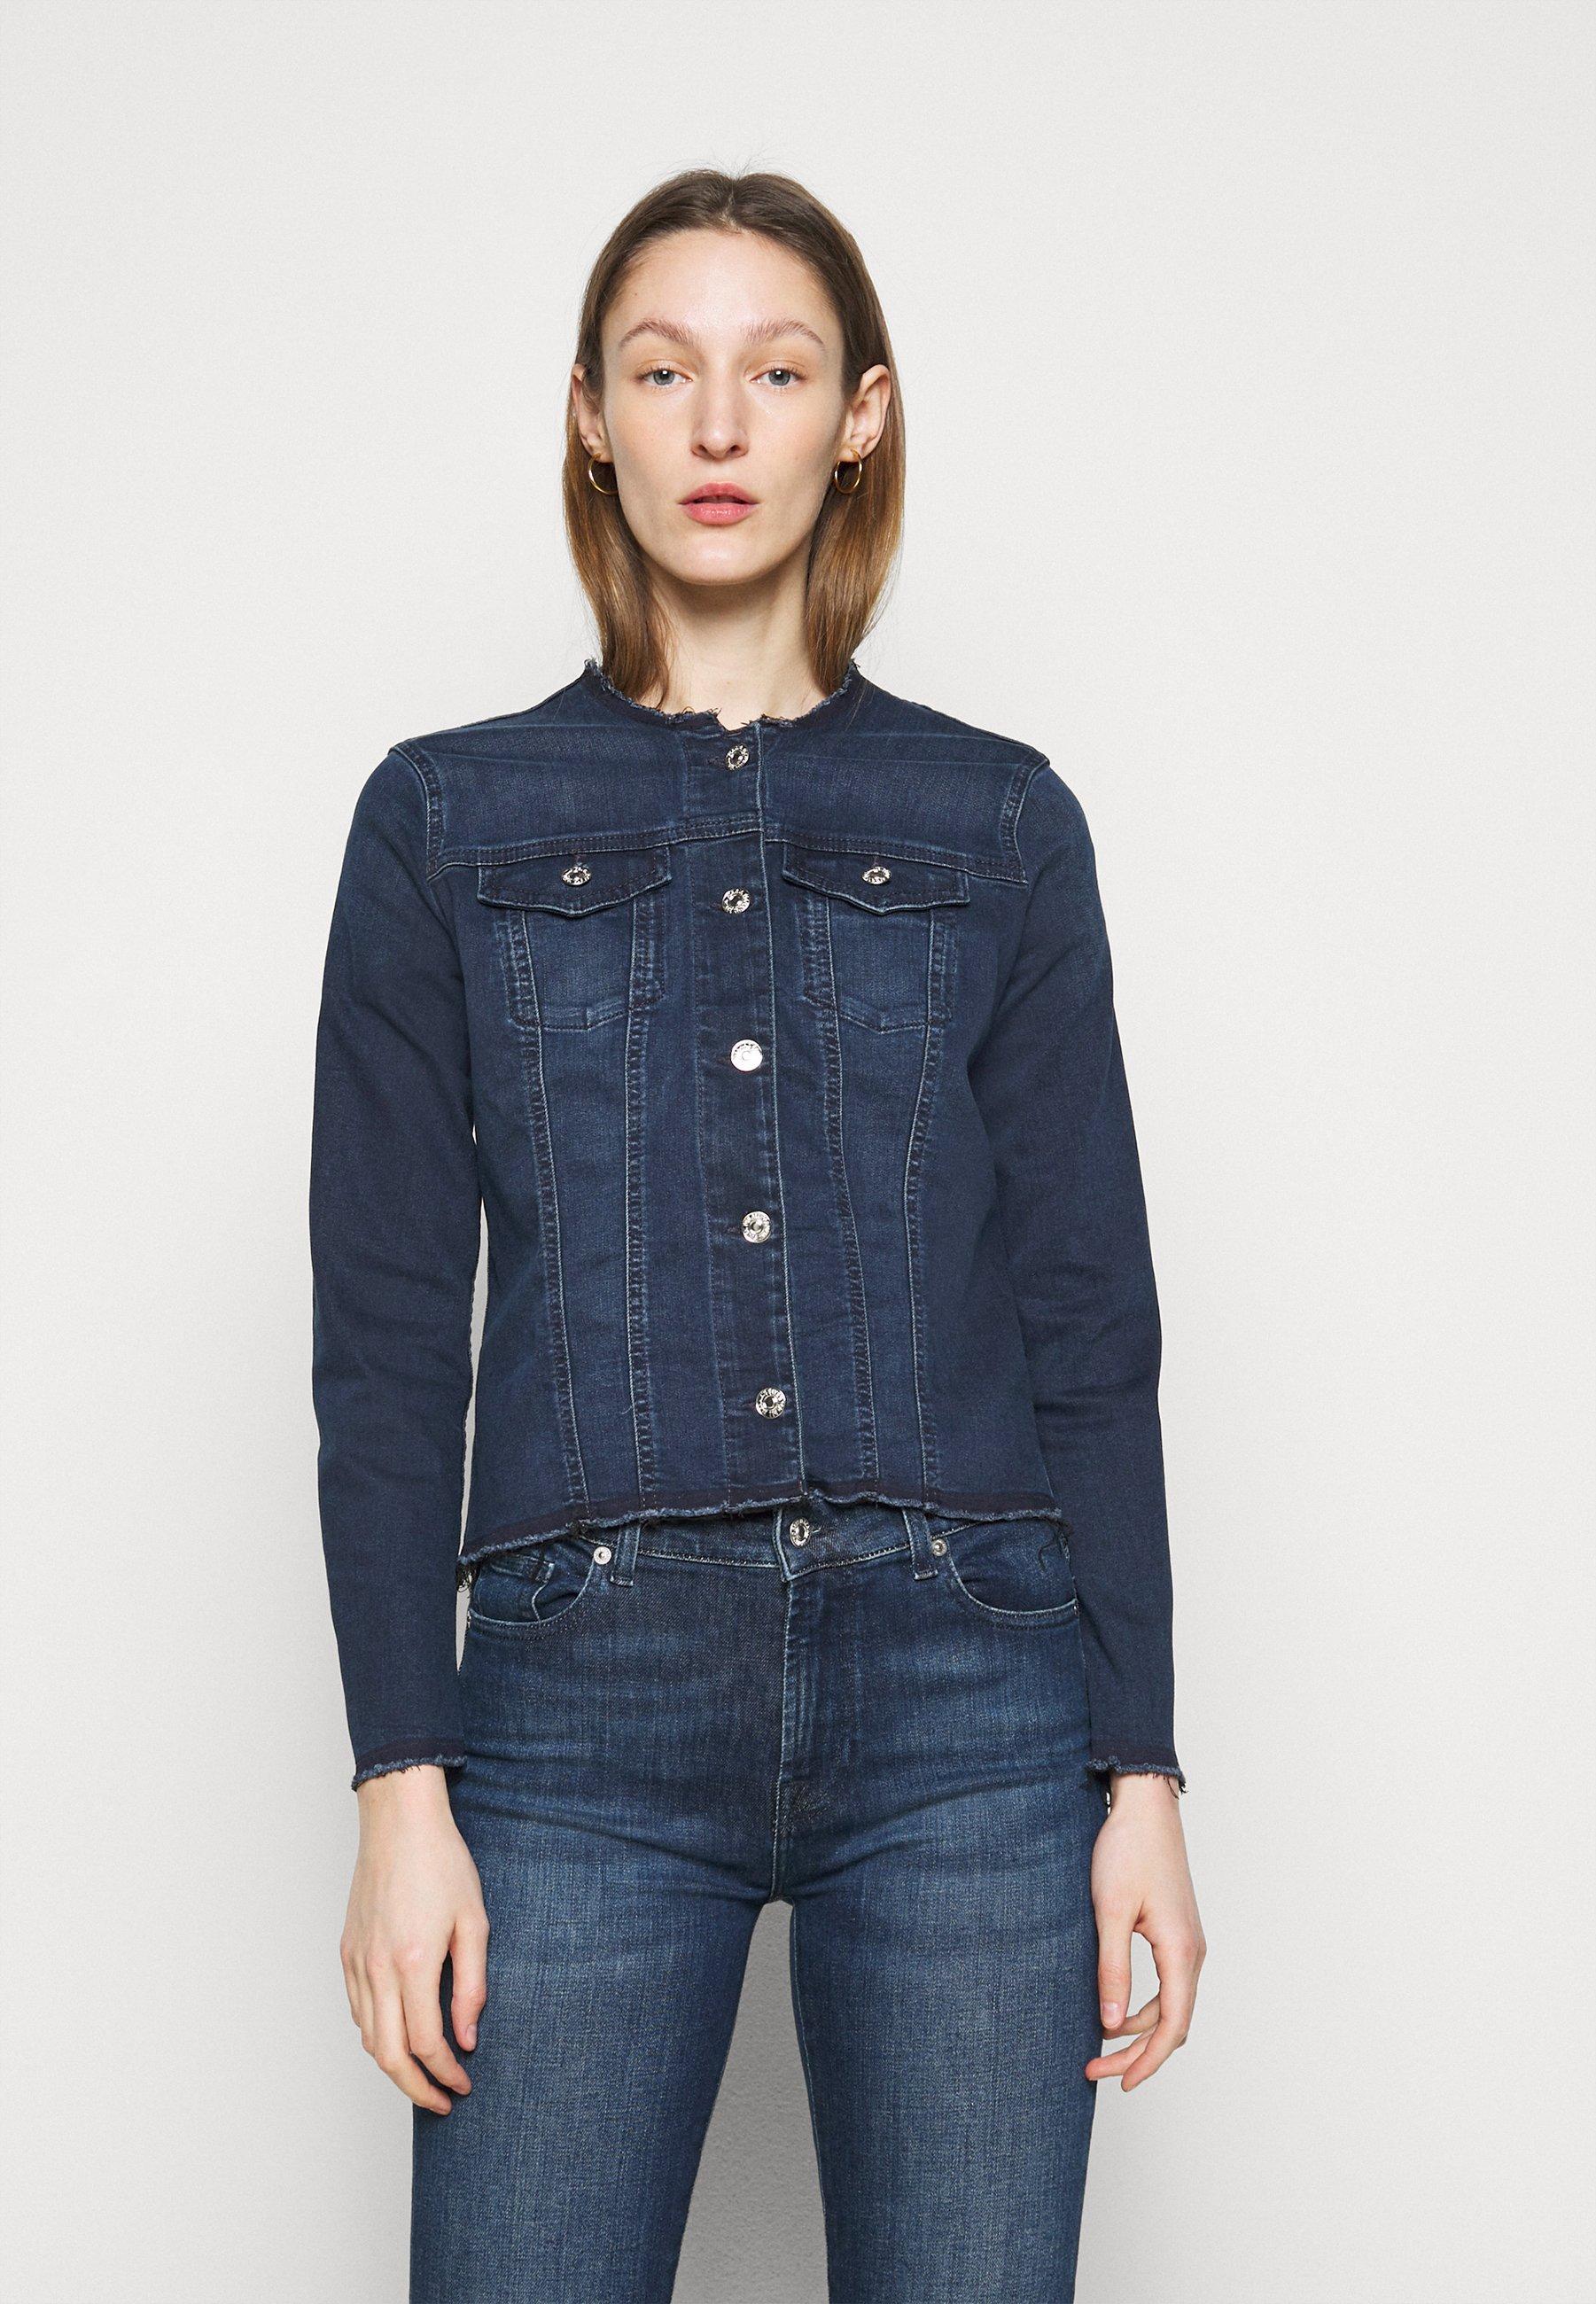 Femme JACKET BAIR PARK AVENUE - Veste en jean